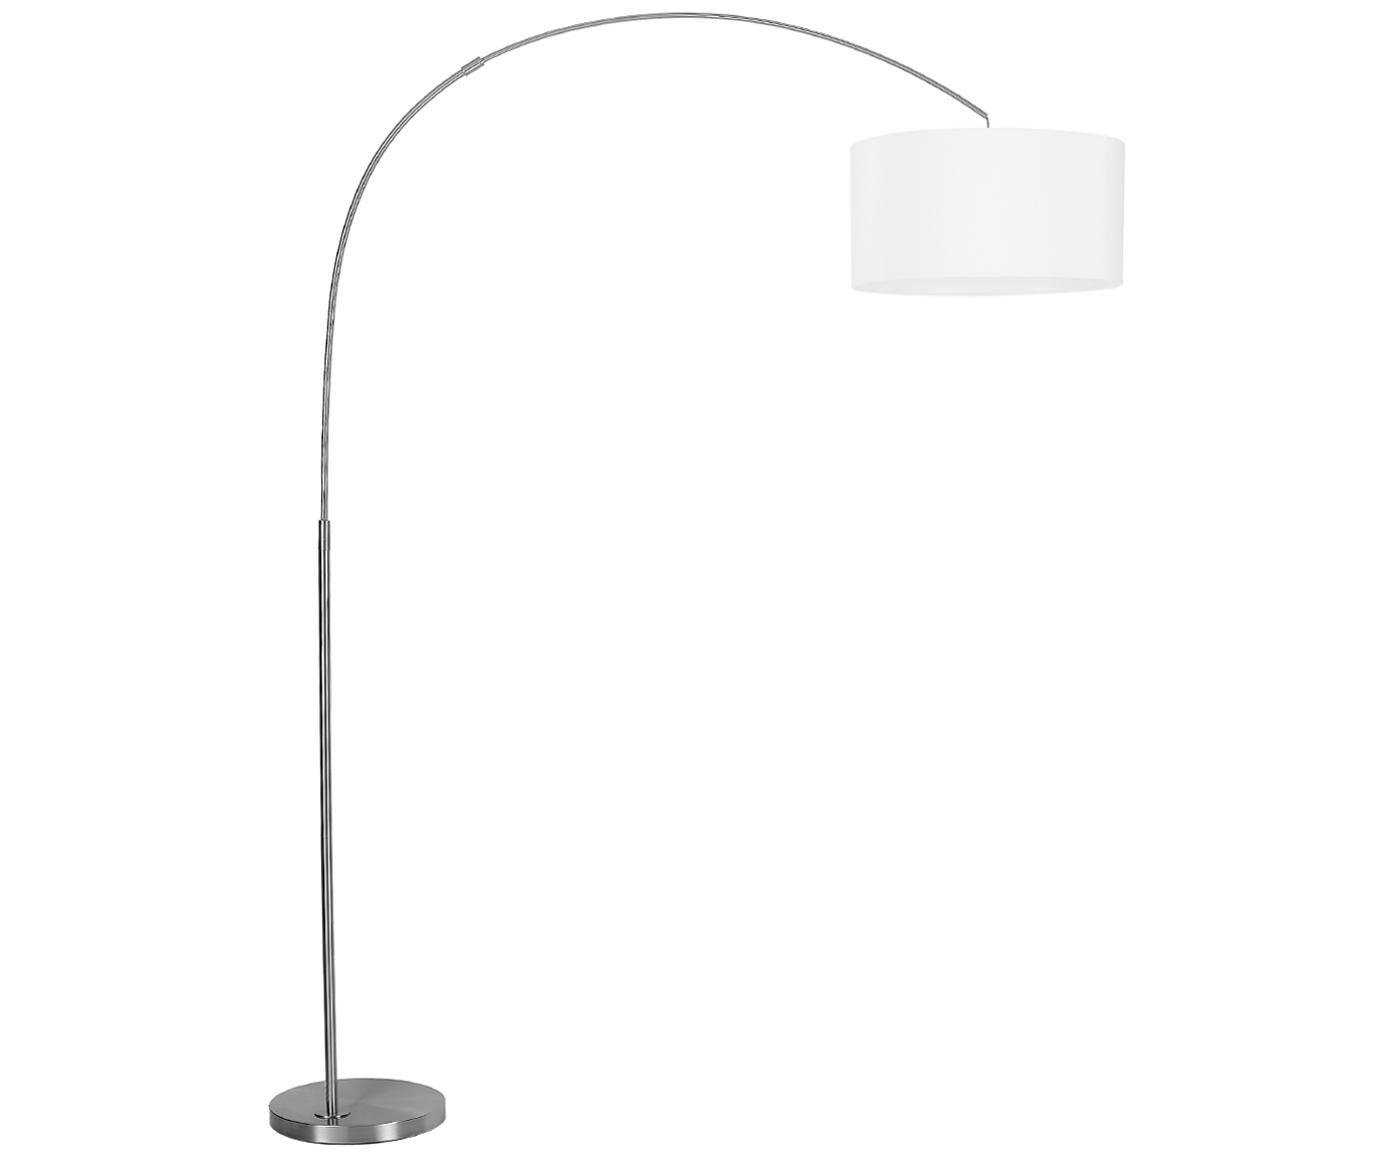 Bogenlampe Niels, Lampenschirm: Baumwollgemisch, Lampenschirm: WeissLampenfuss: ChromKabel: Transparent, 157 x 218 cm